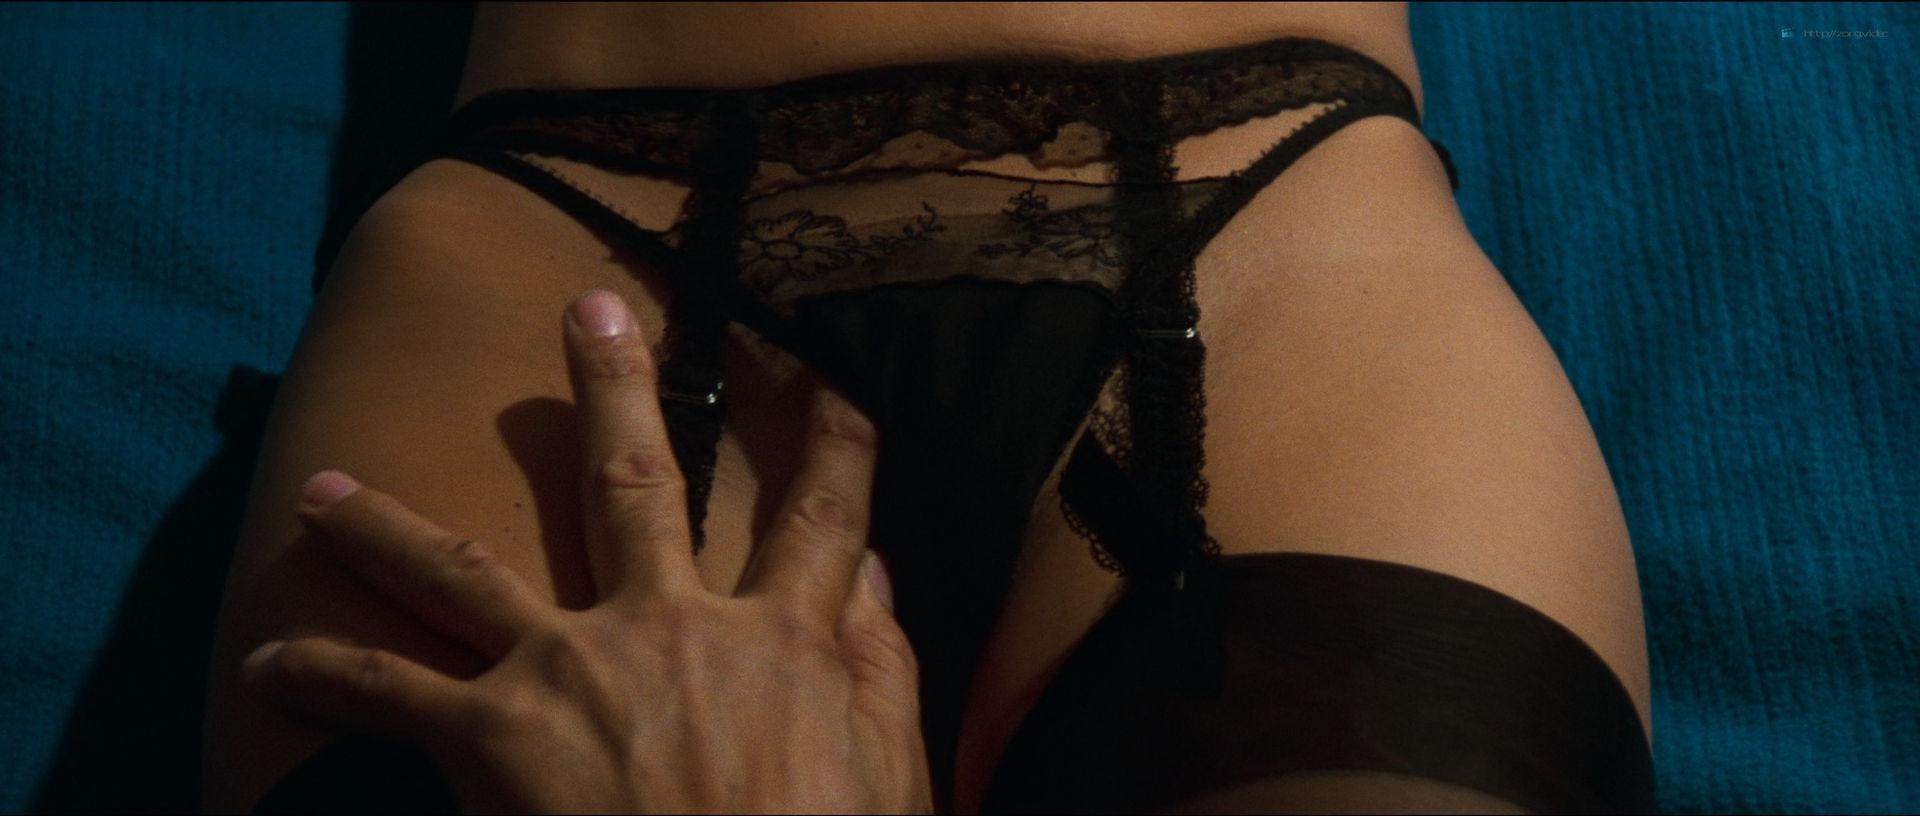 Daniela Doria nude full frontal Zora Kerova and other nude - The New York Ripper (IT-1982) HD 1080p BluRay(r) (6)